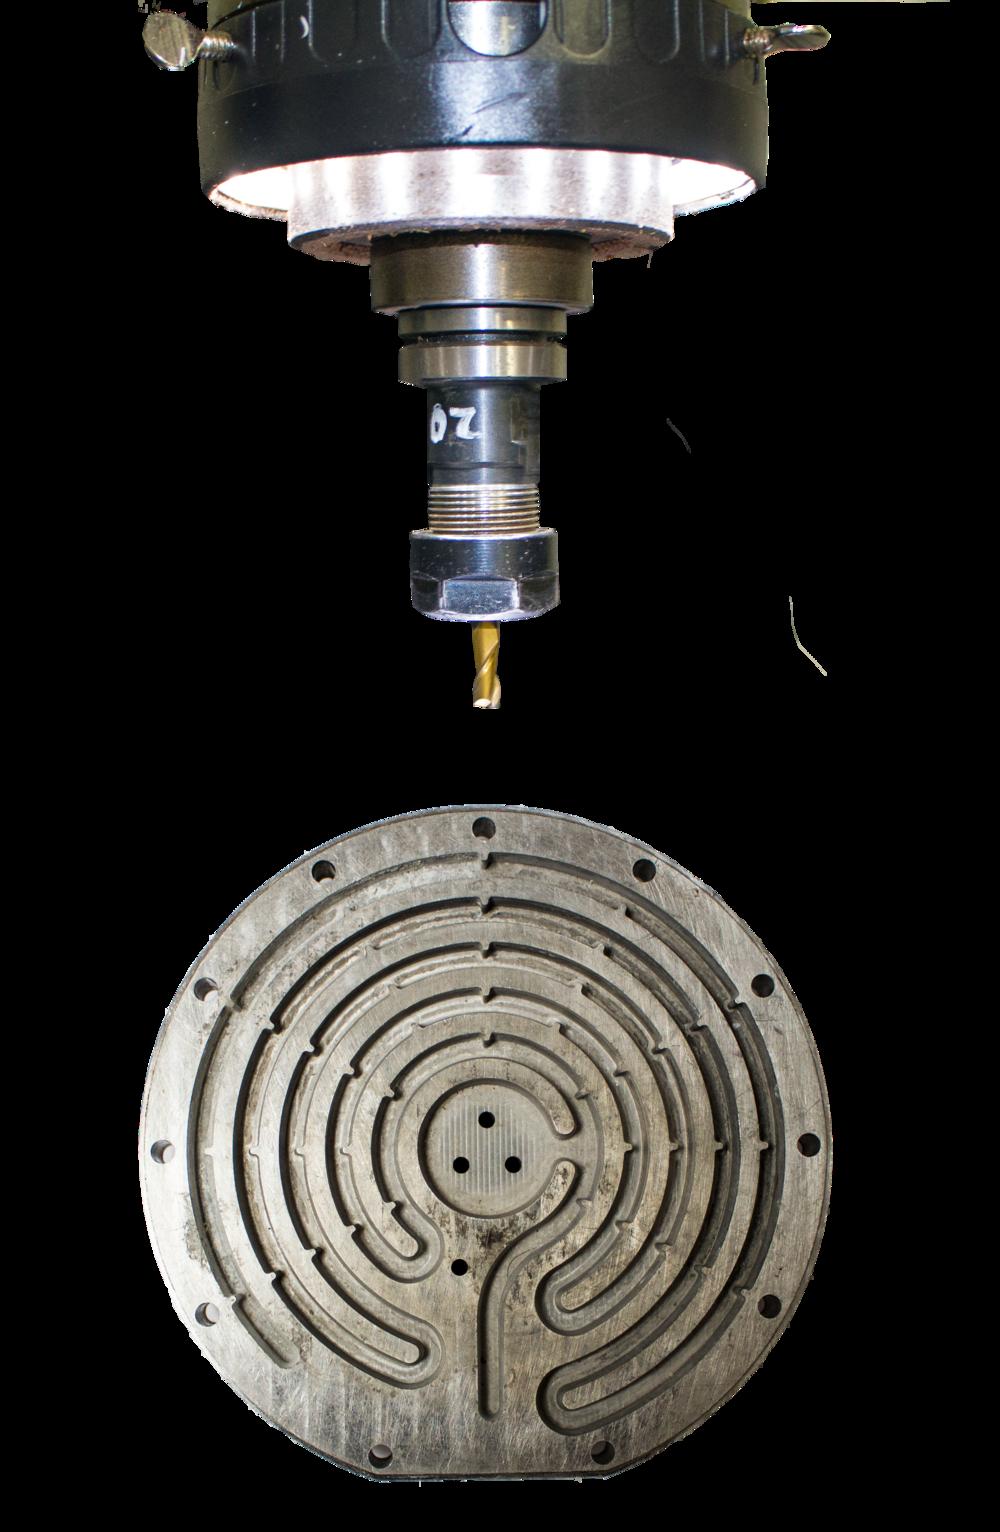 CNC Mill tool